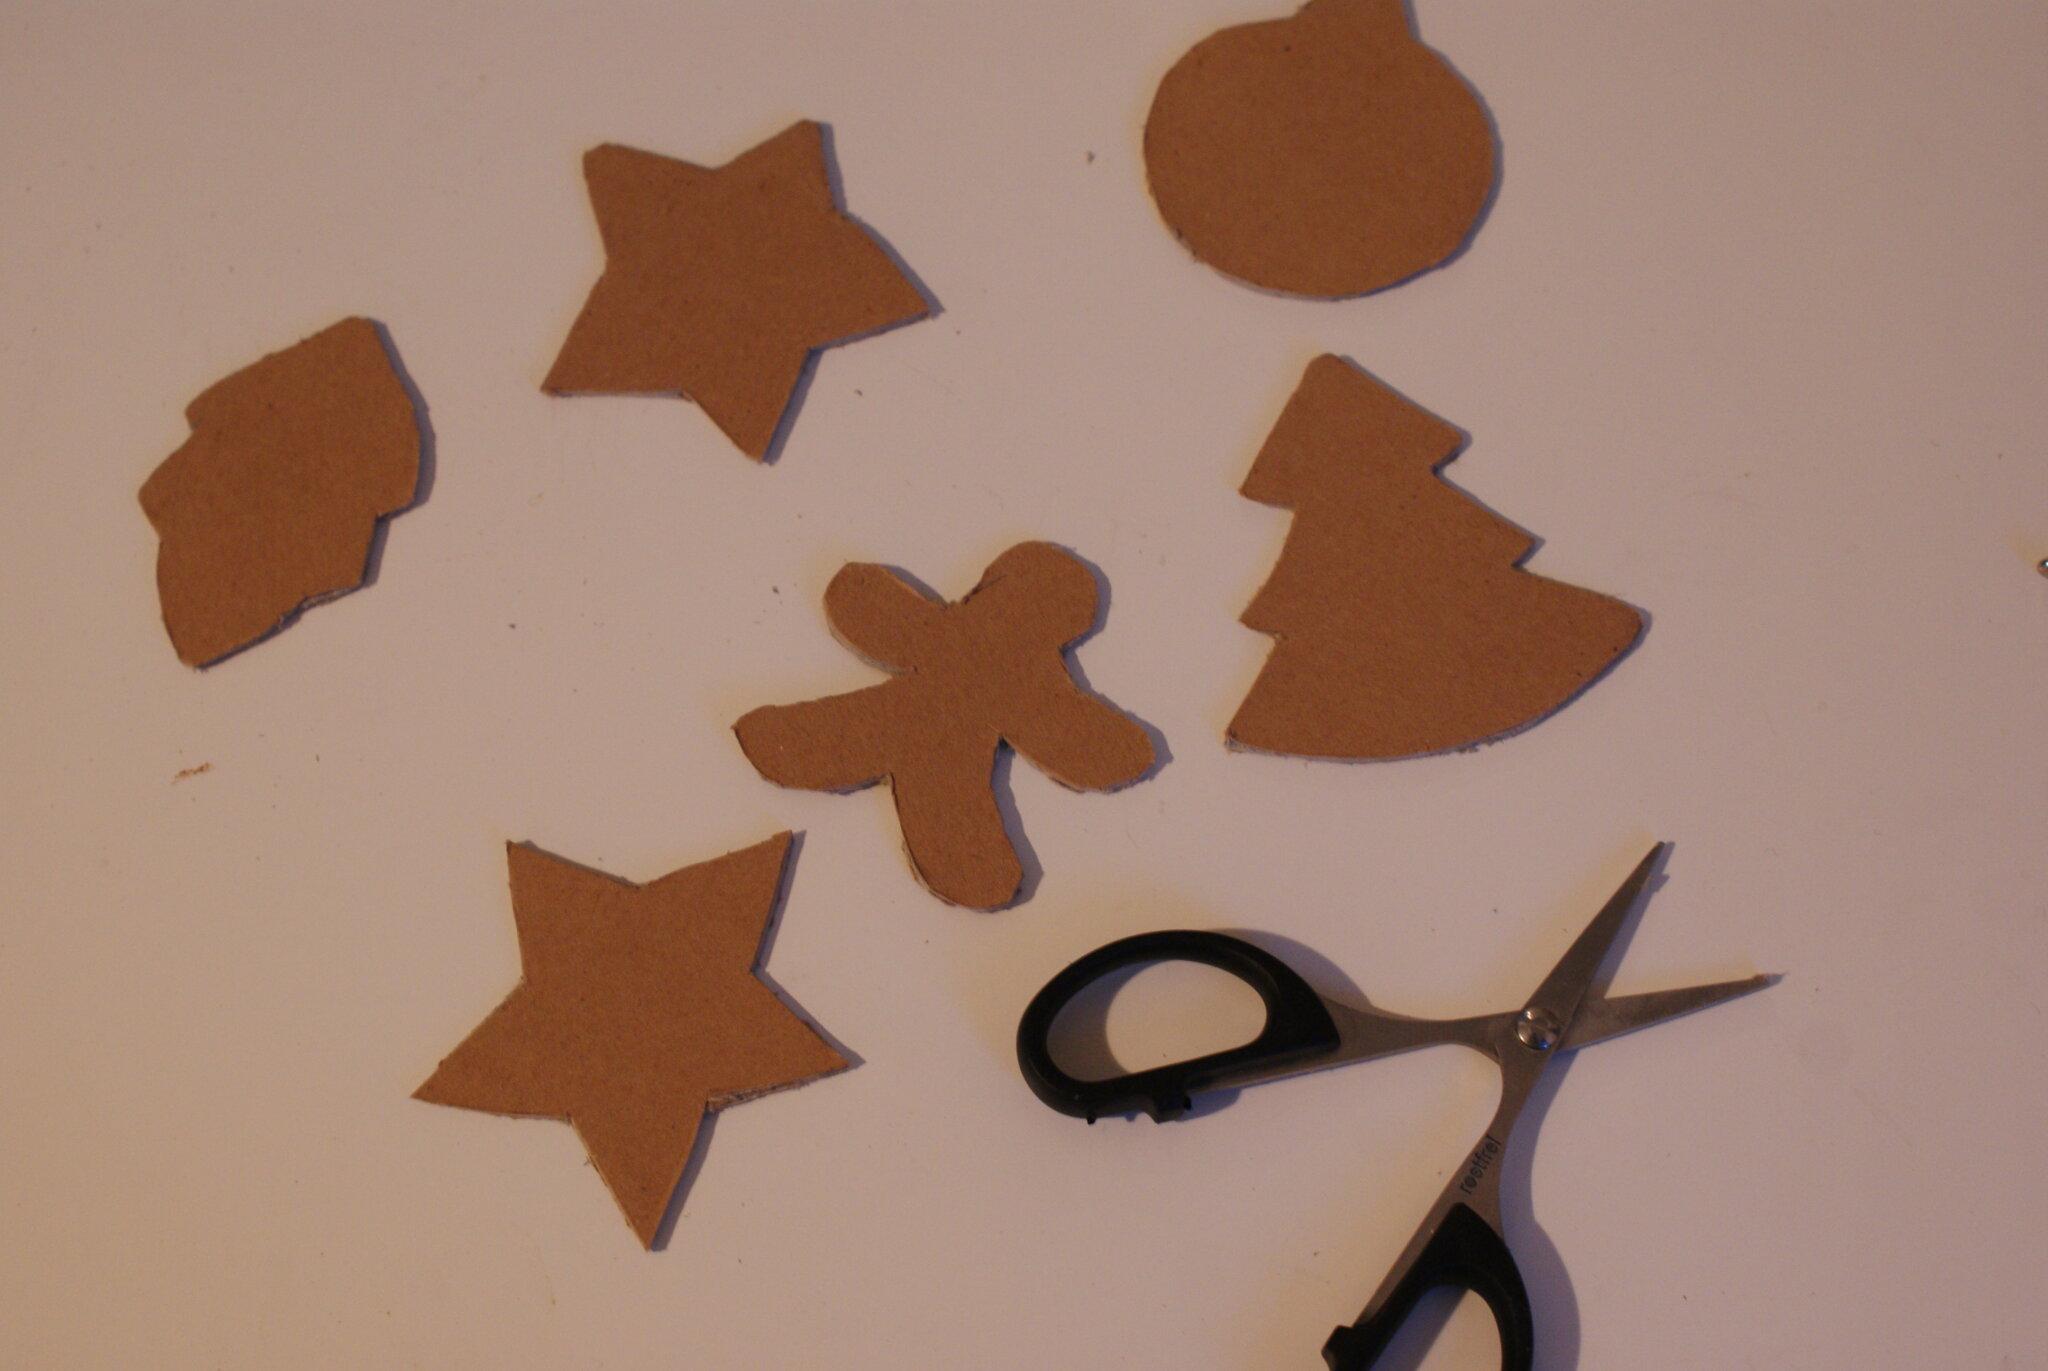 diy cardboard gingerbread cookies christmas tree ornaments idea easy last minute francinesplaceblog tutorial